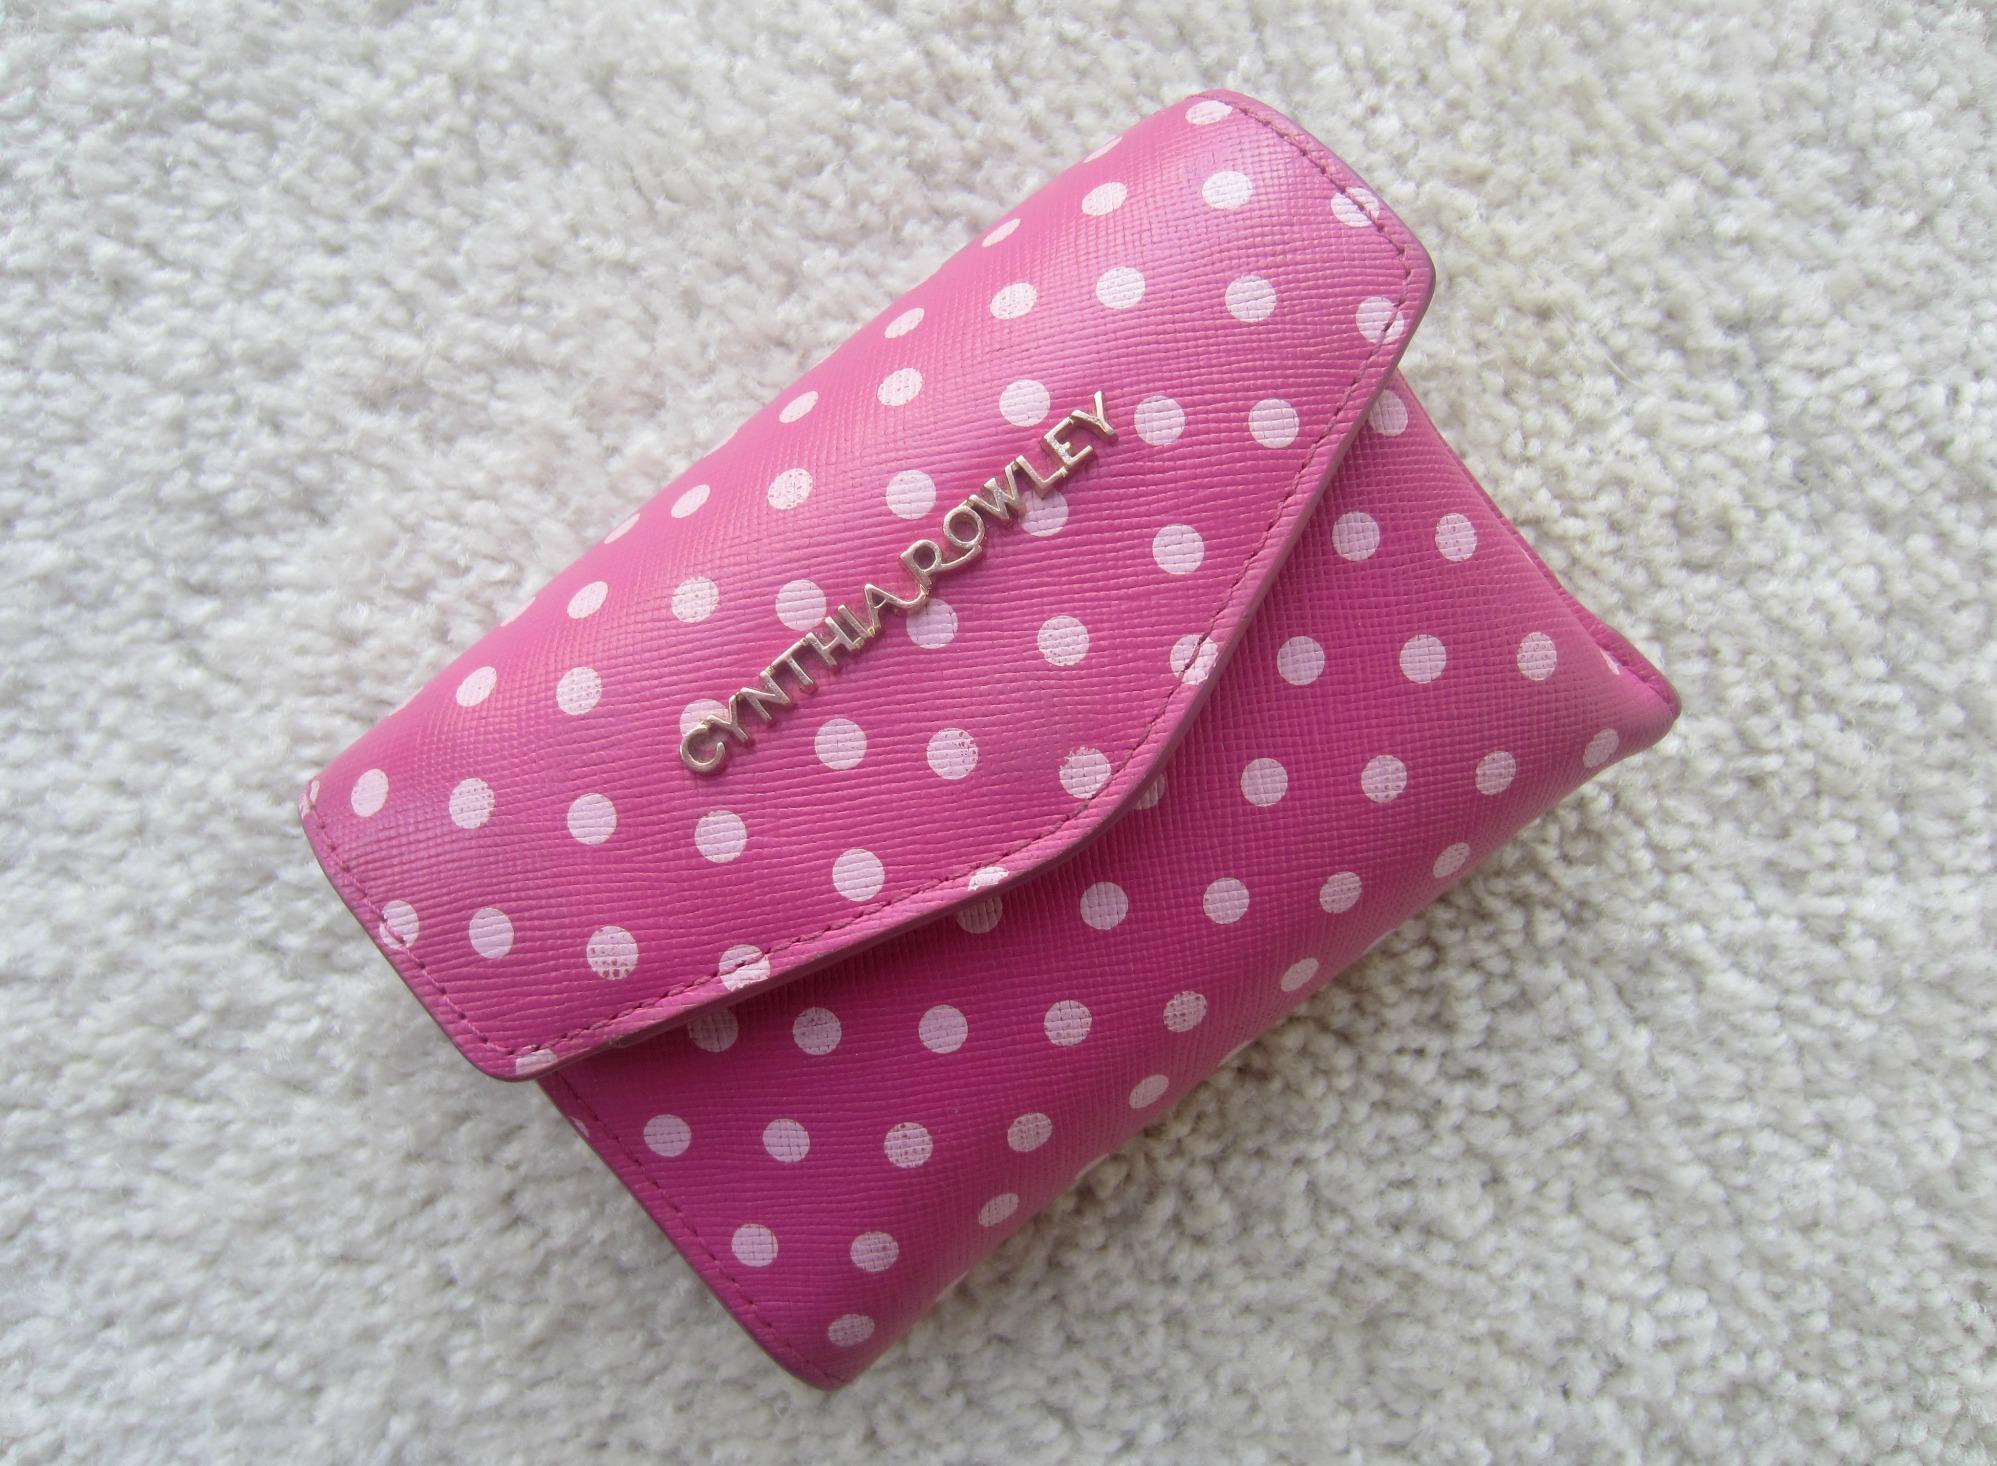 cynthia rowley wallet